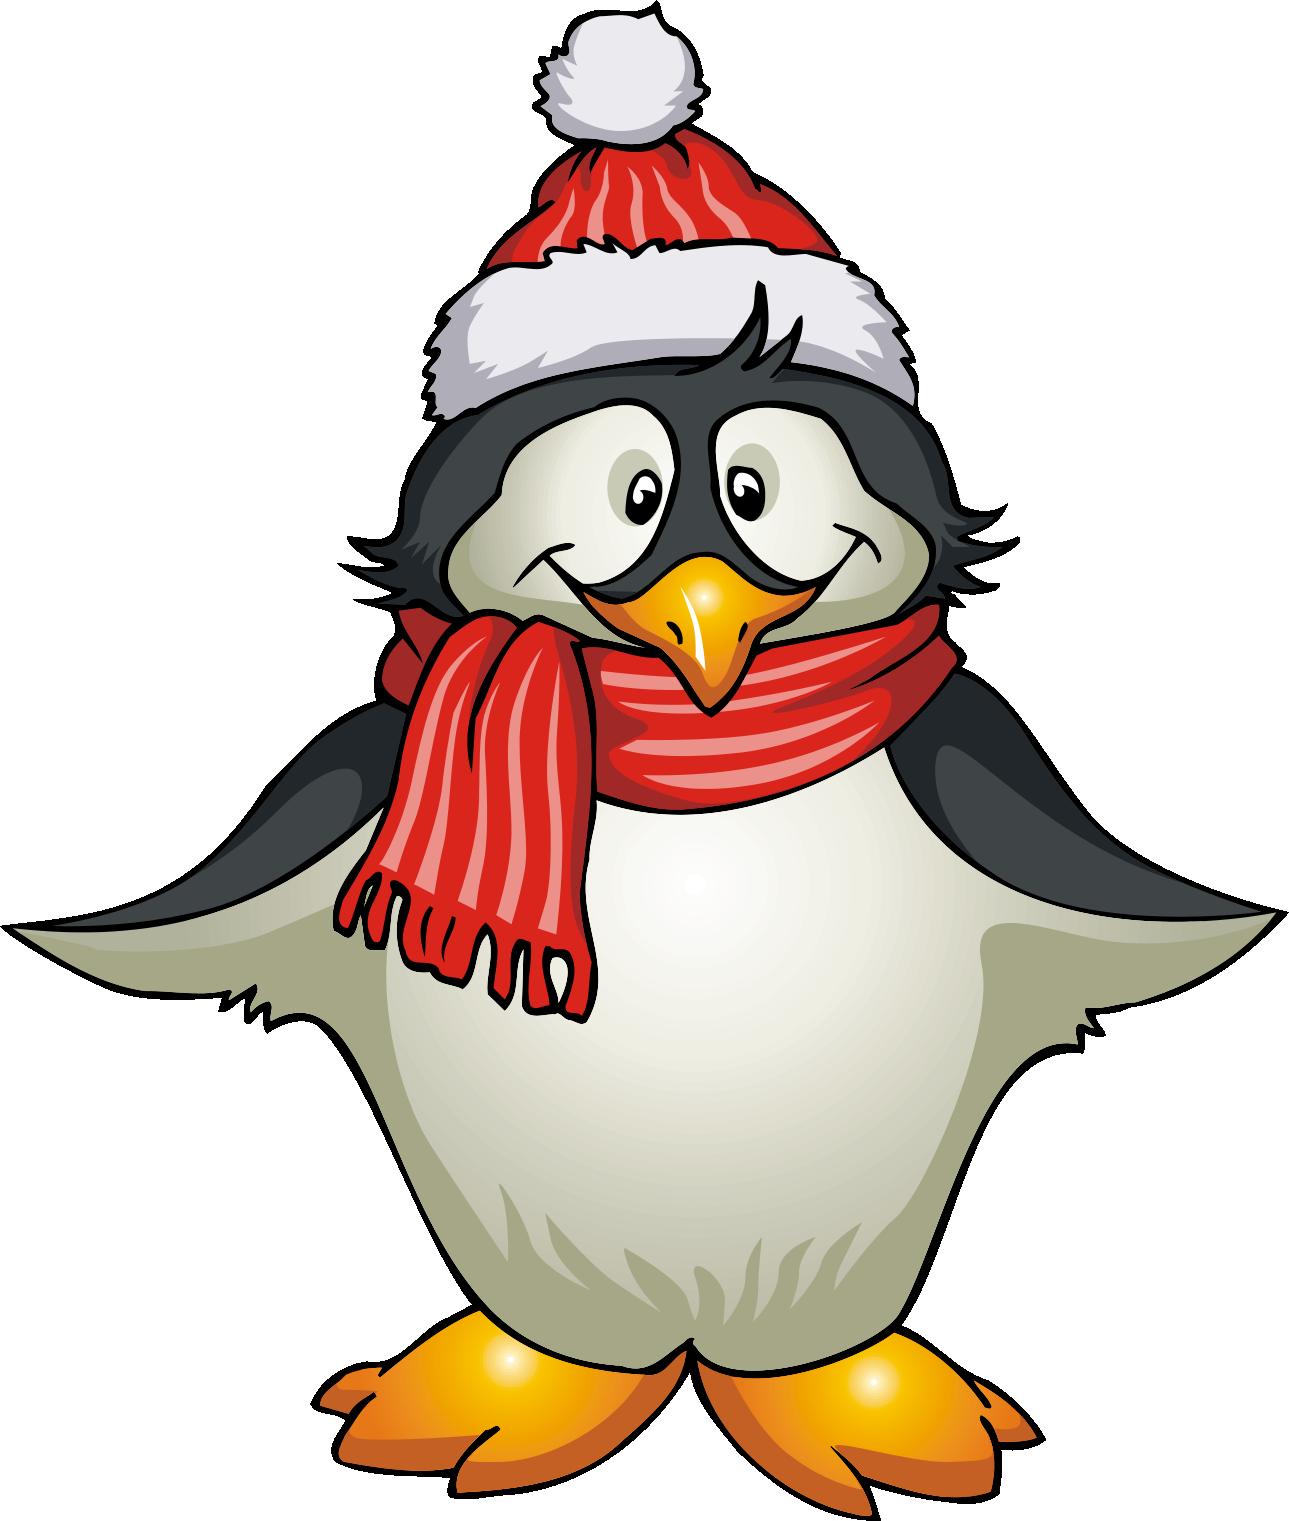 1289x1521 Winter Penguin Clipart Clipart Panda